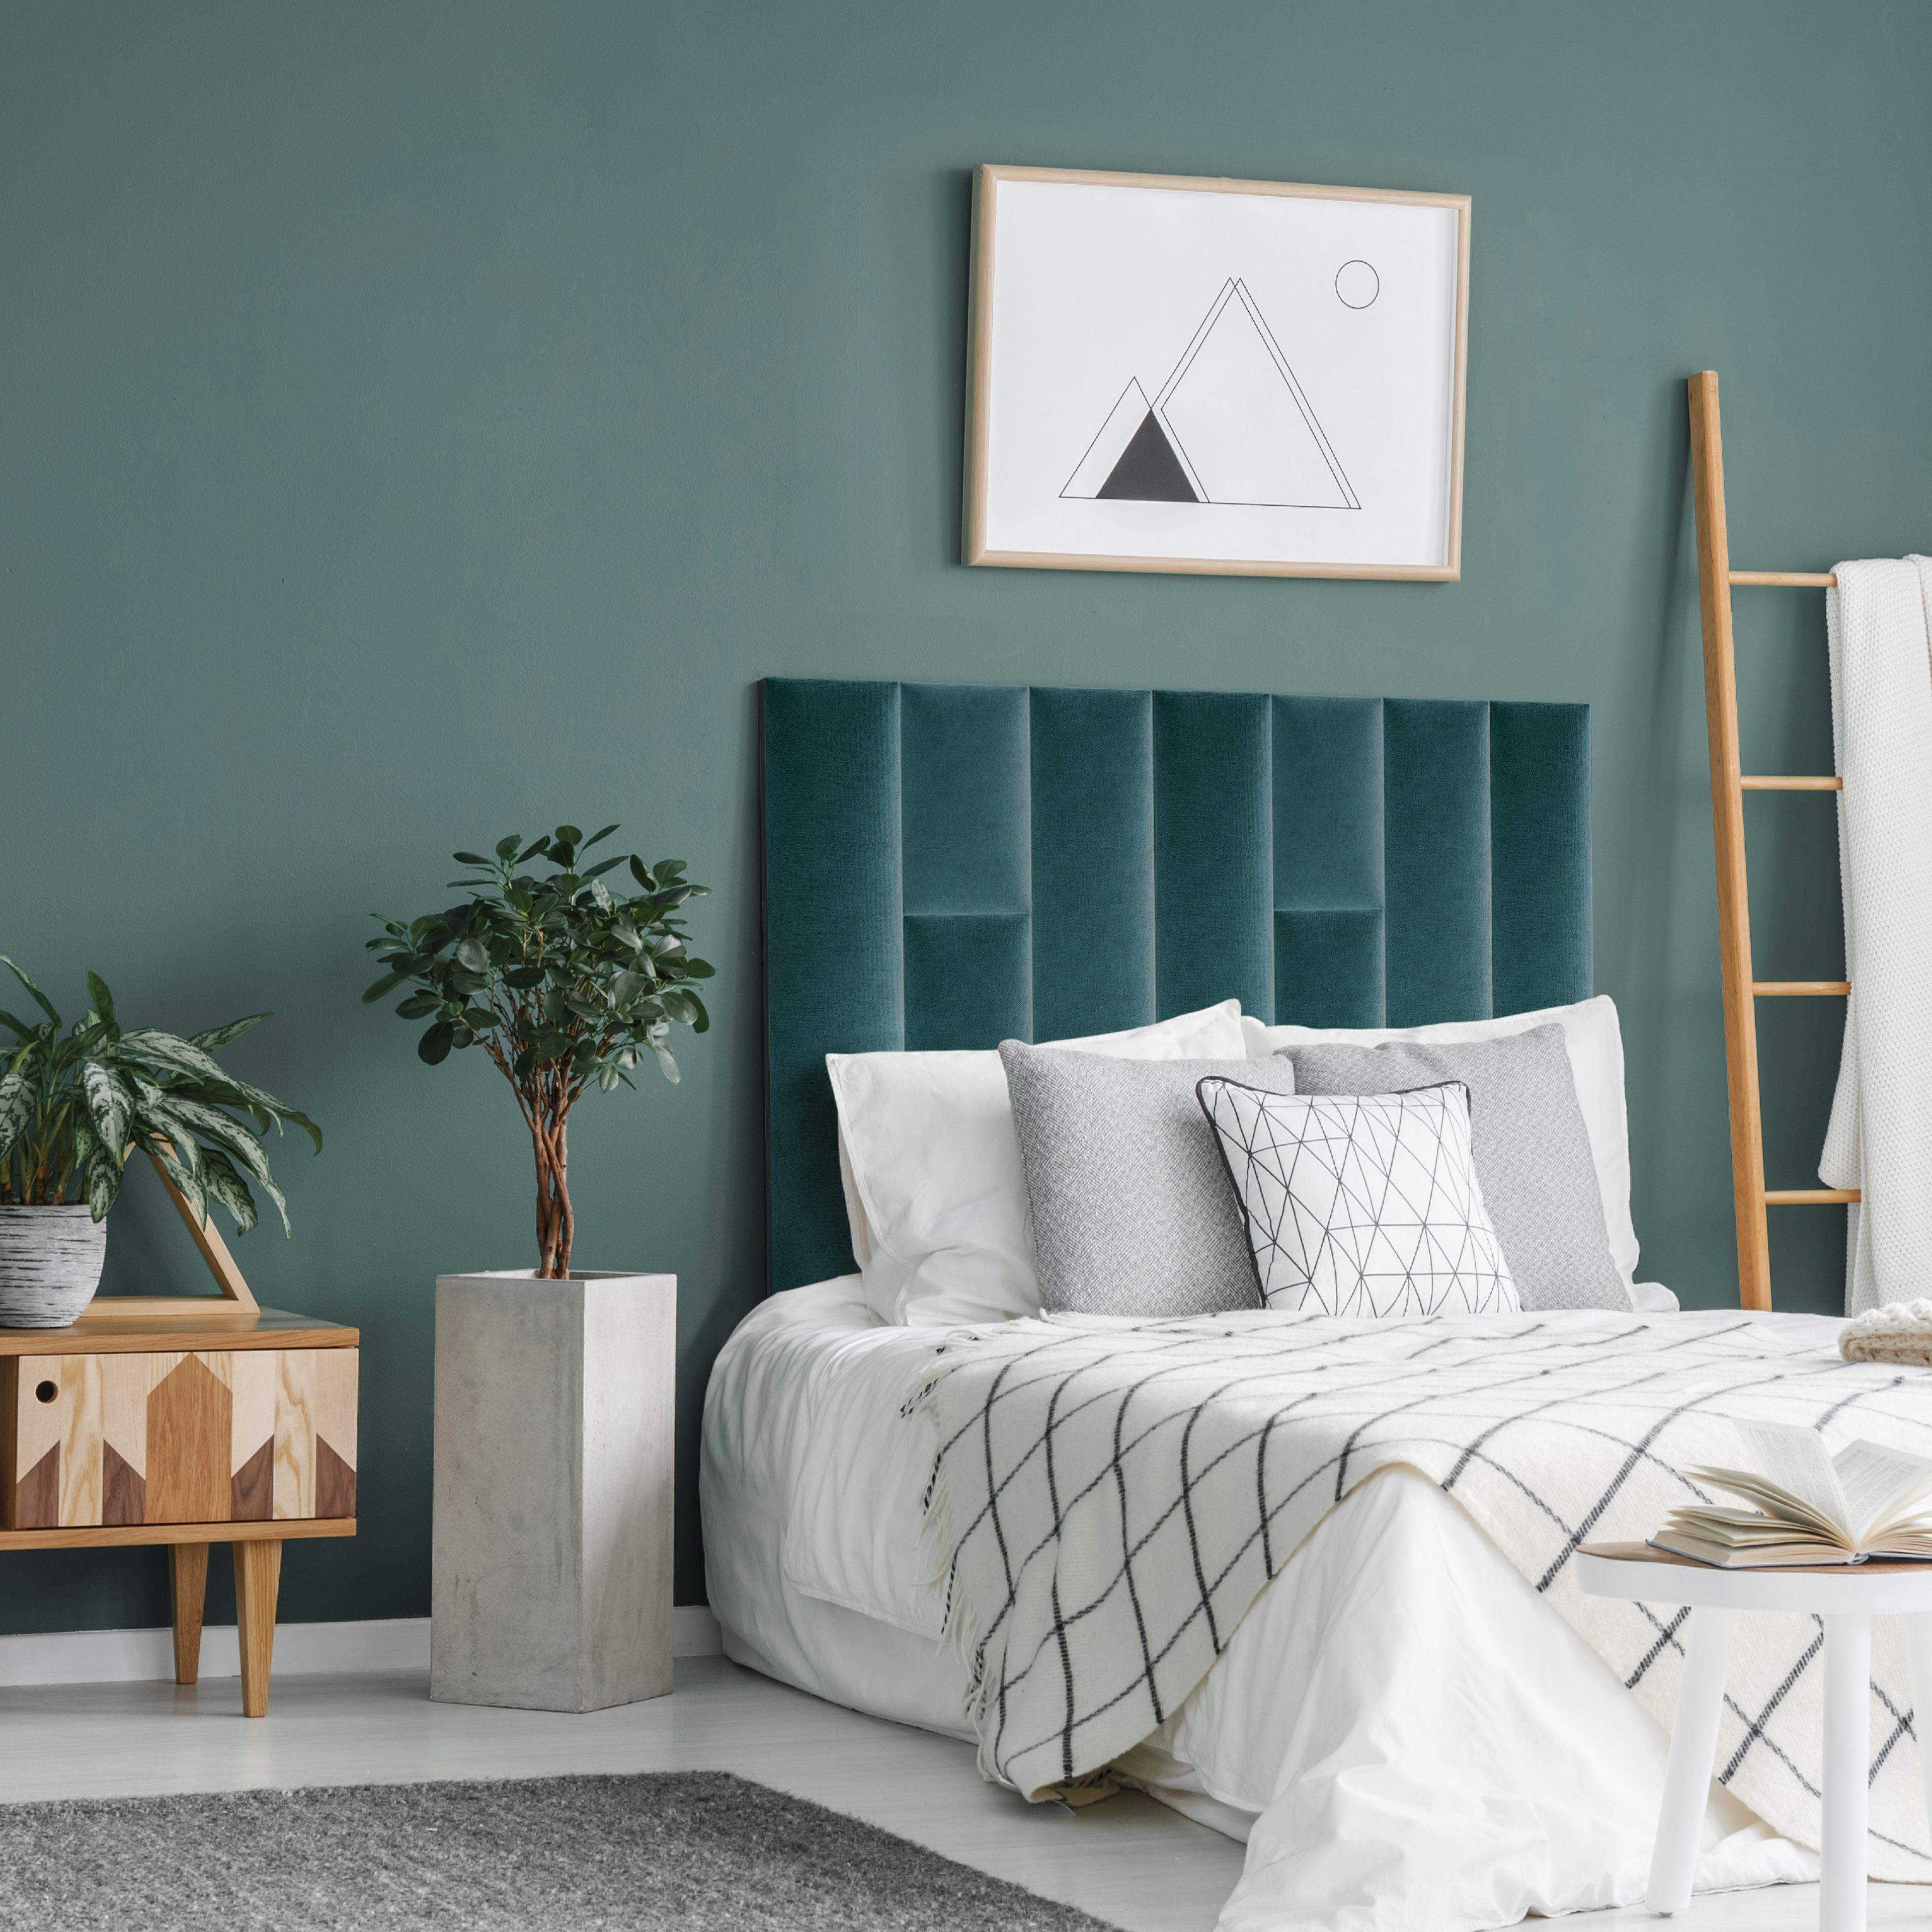 Mollis Basic 03 Home Decor Decor Upholstered Panels